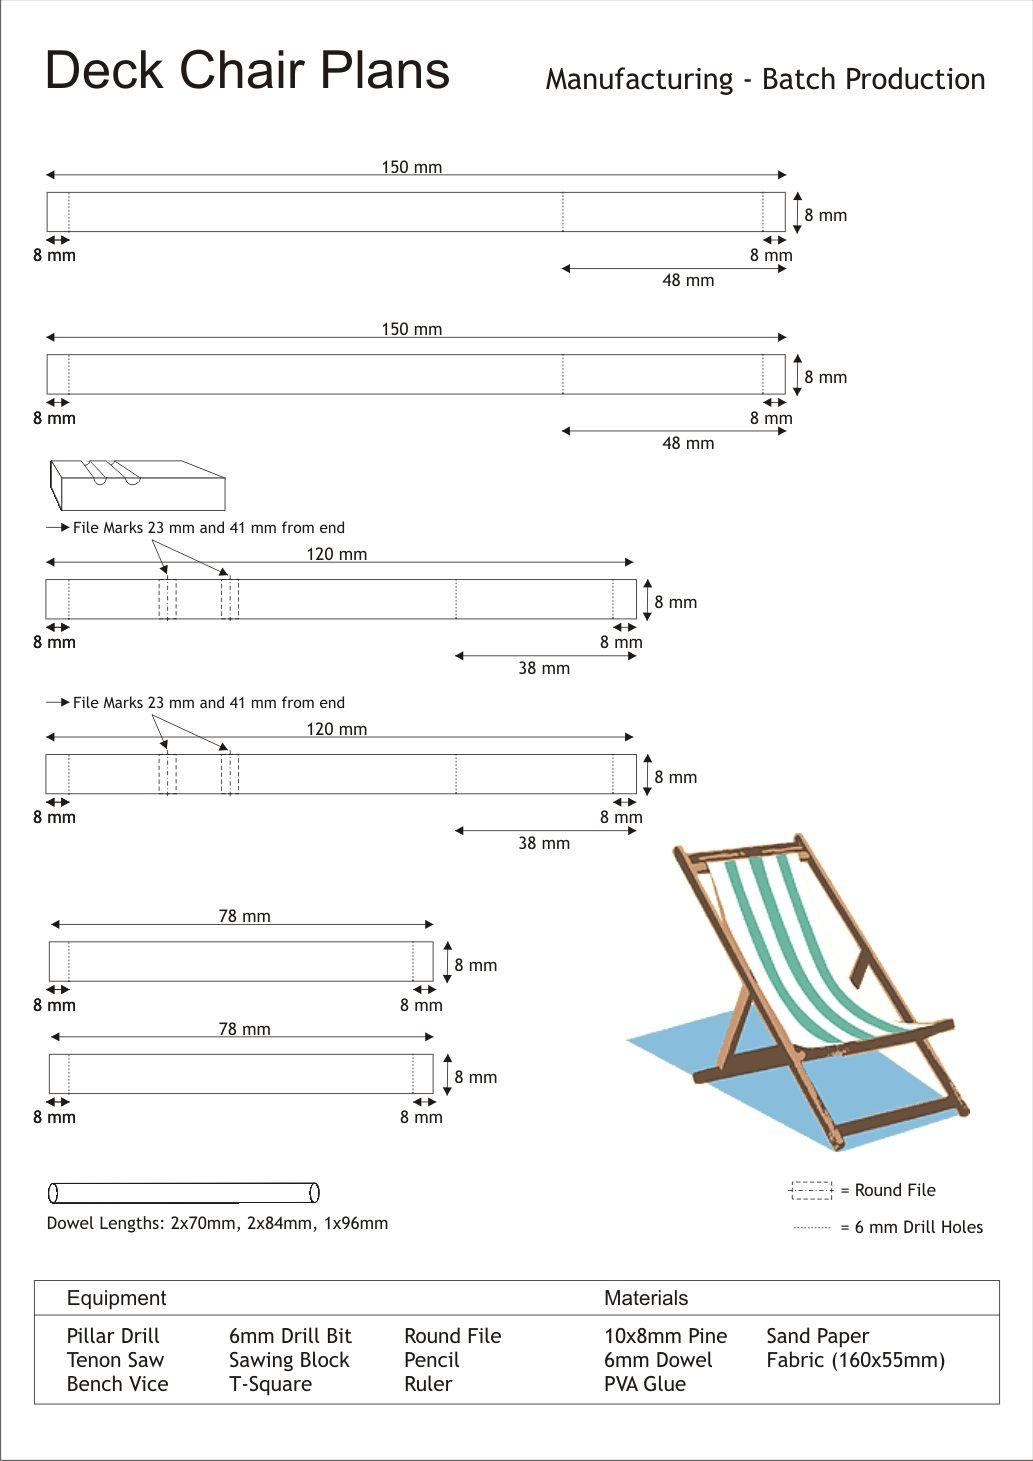 Planos de cadeira de praia · Deck ChairsWoodworking PlansWood ...